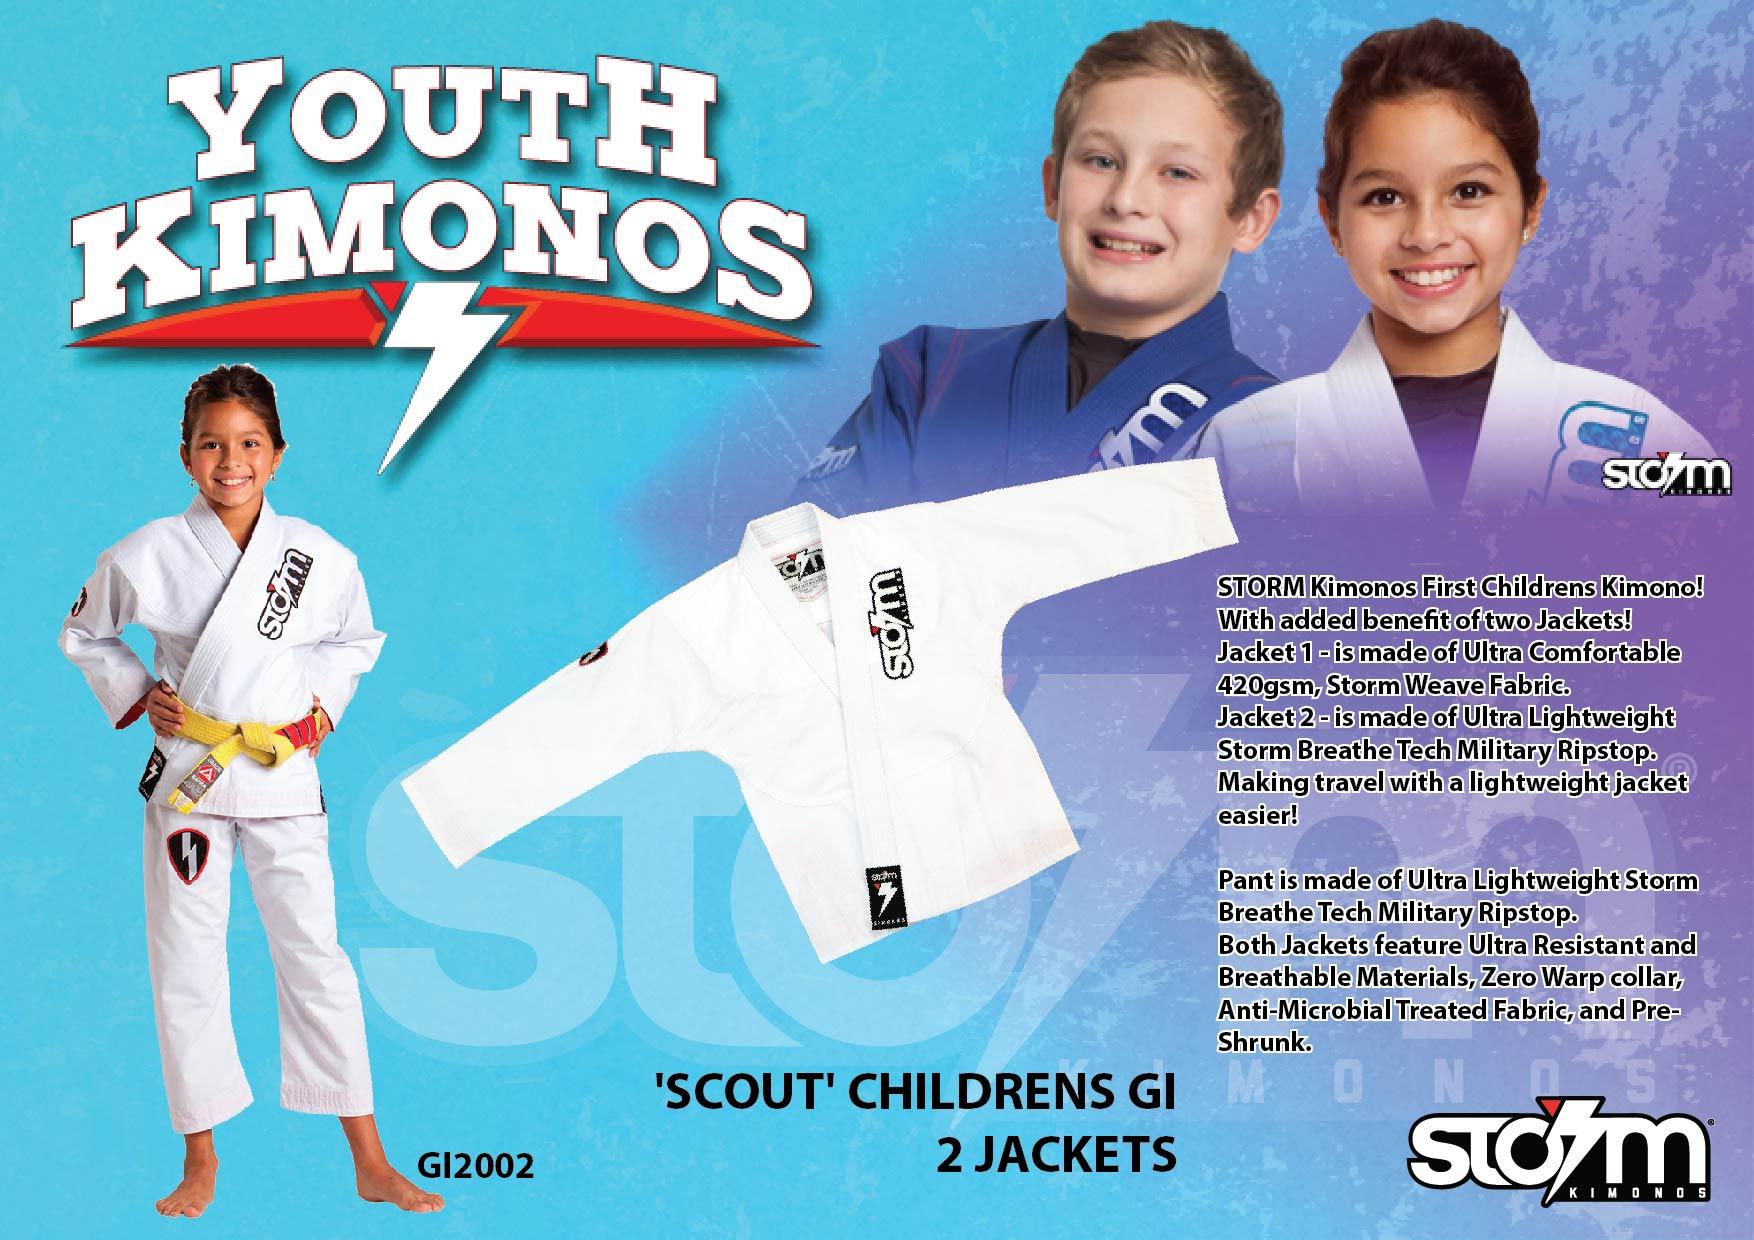 21 GI2002 STORM Kimonos® Scout - W